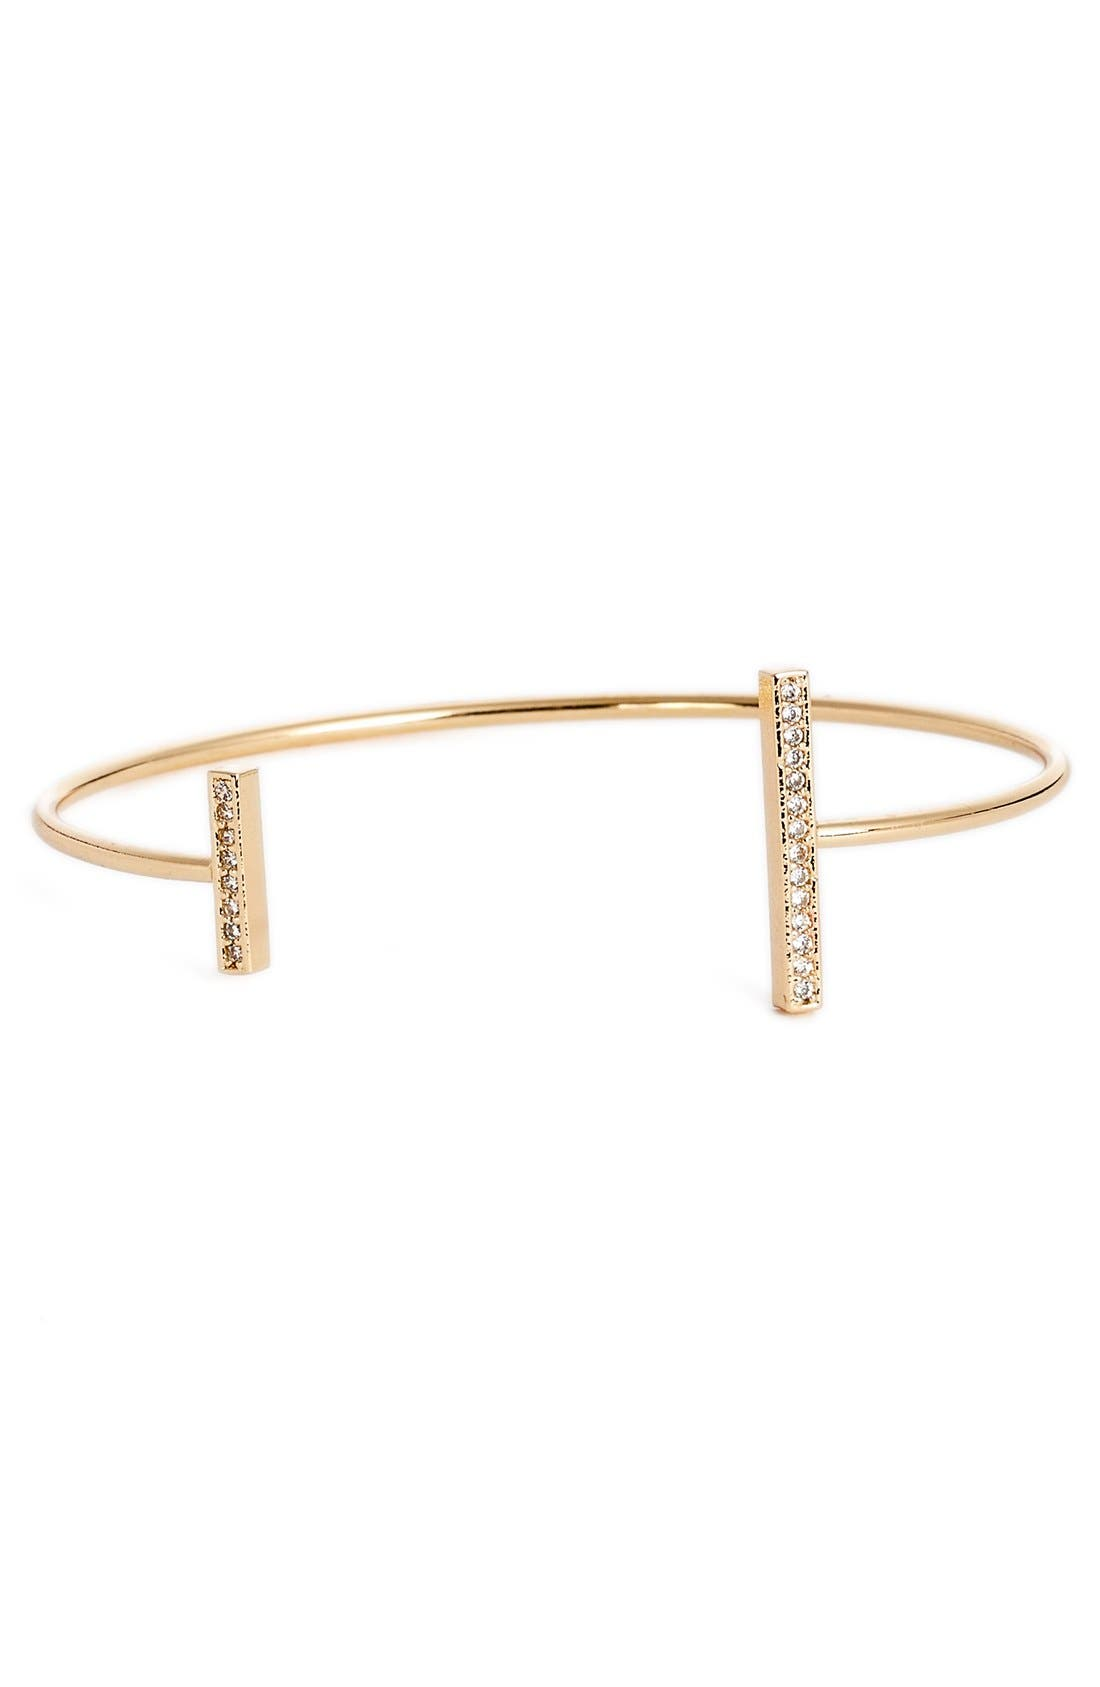 Stone Bar Cuff Bracelet,                             Main thumbnail 1, color,                             Gold